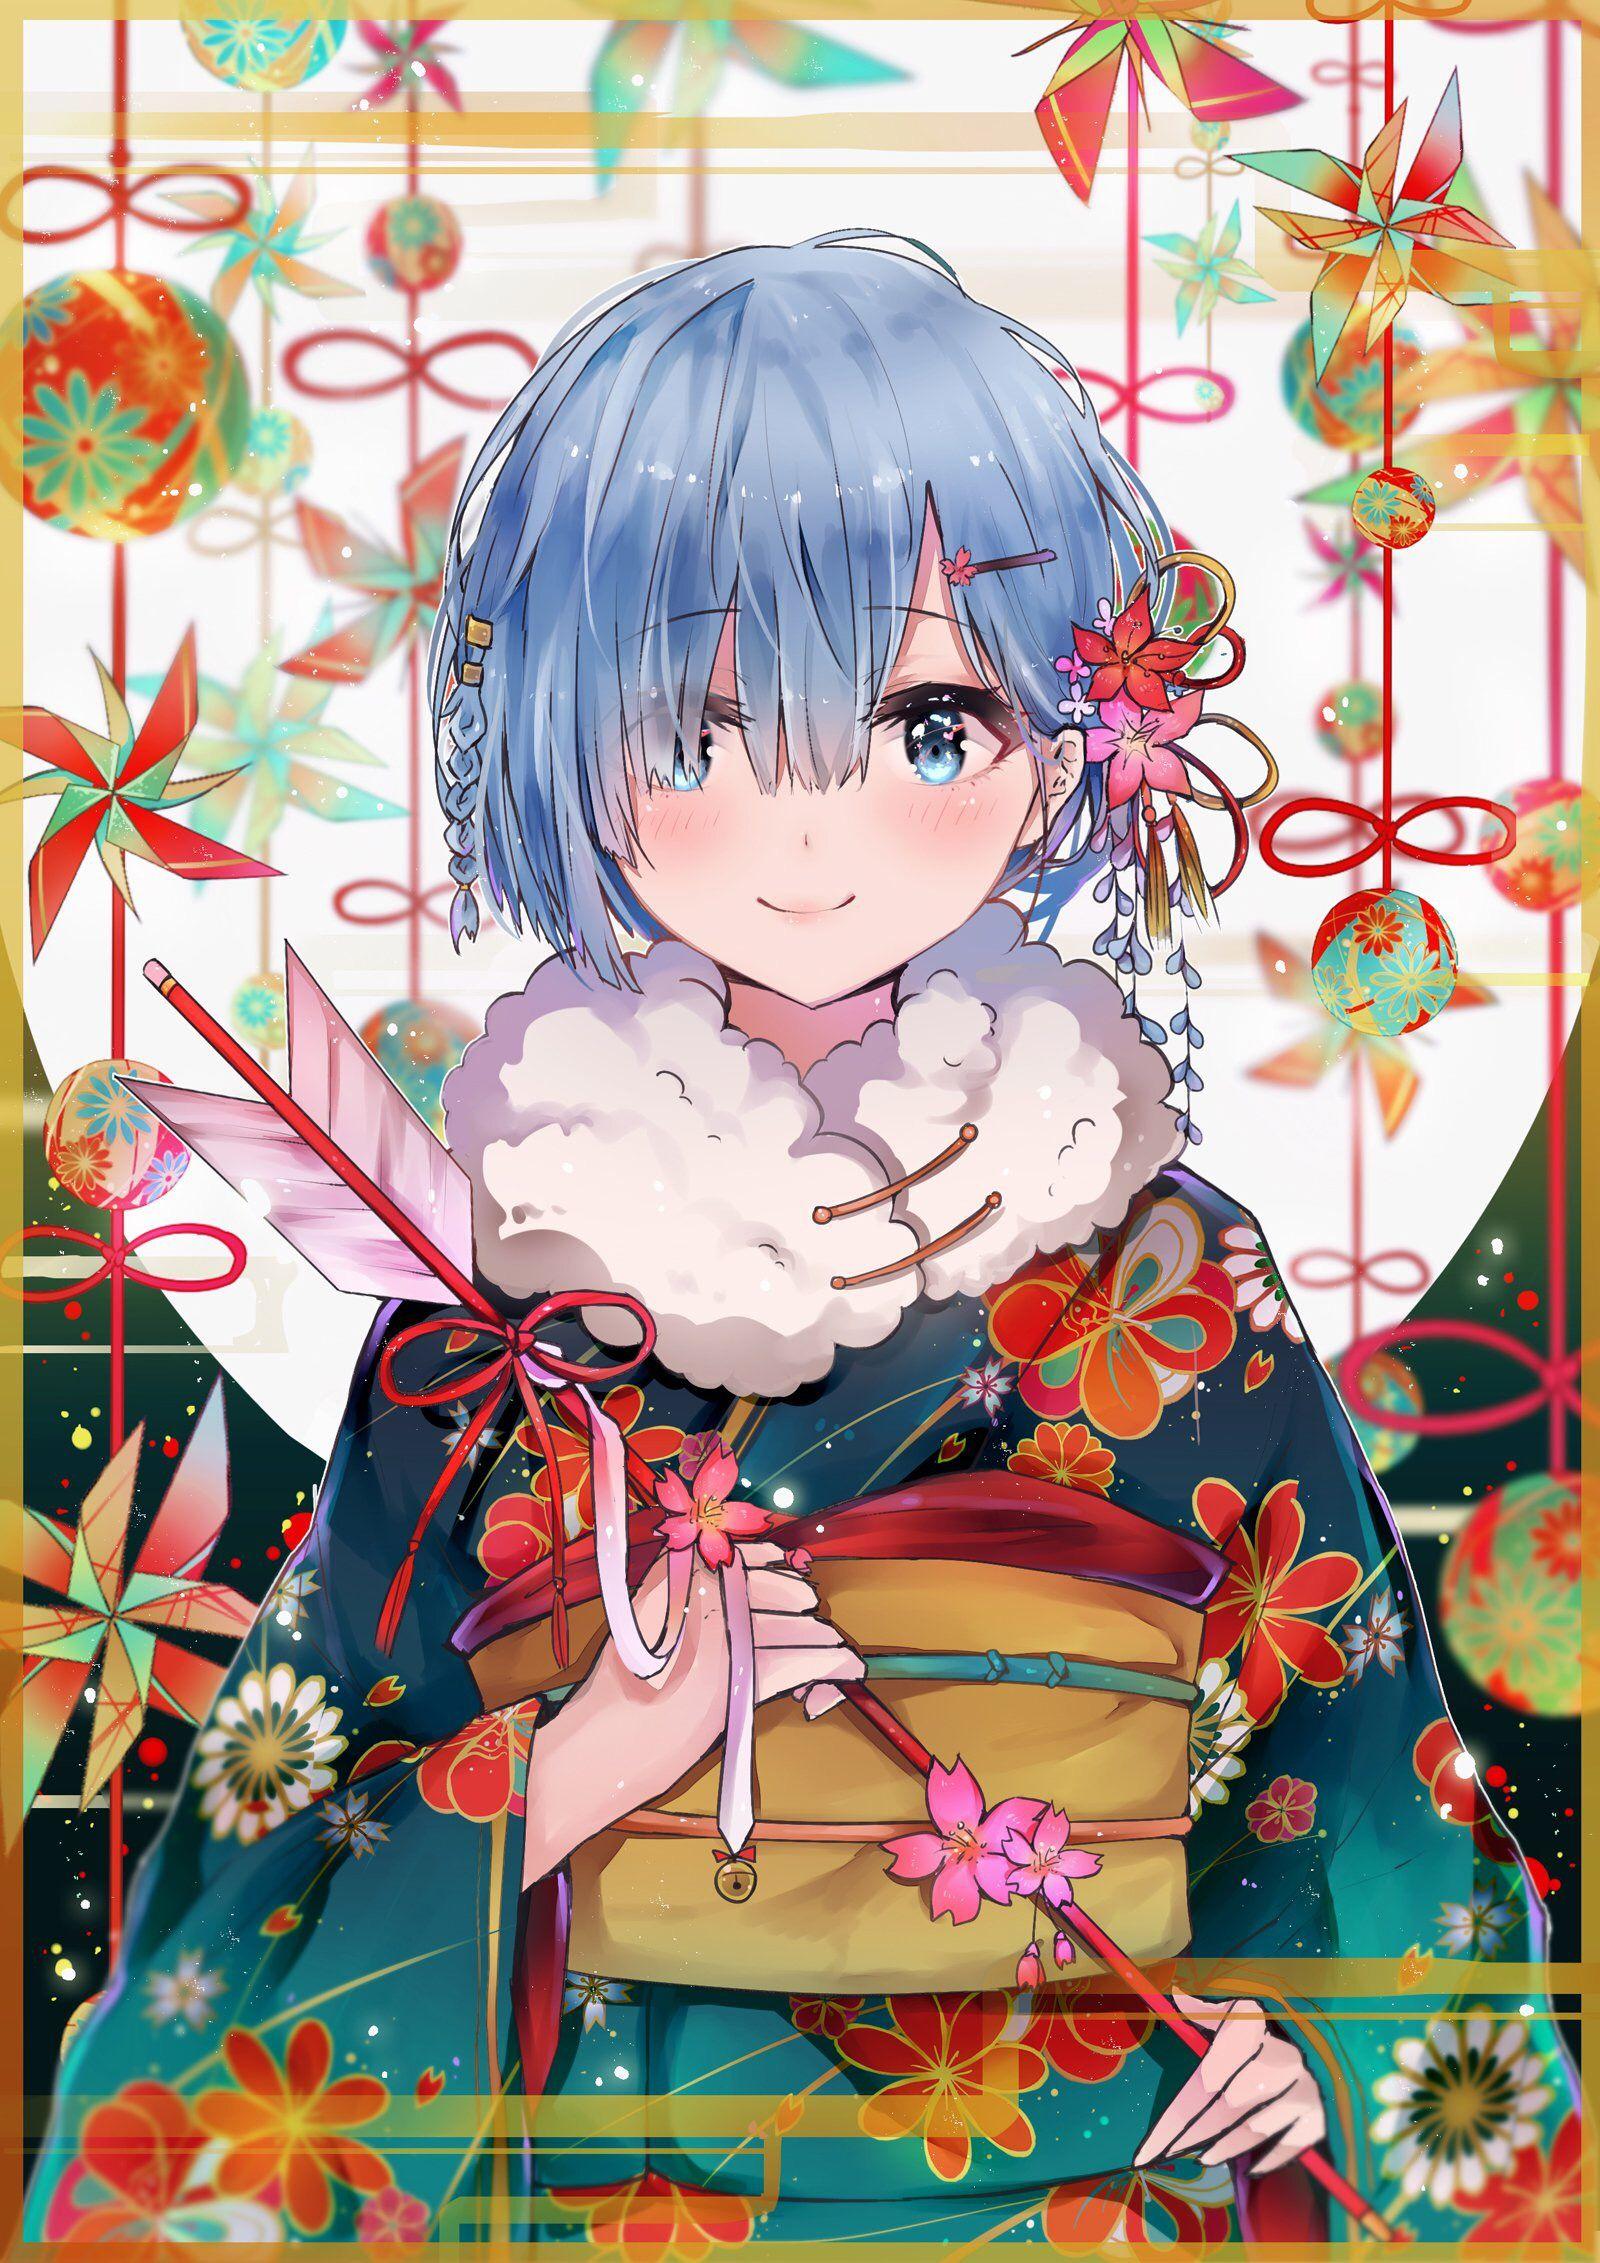 Anime girls with Kimono에 있는 Eon님의 핀 귀여운 애니메이션 소녀, 애니메이션